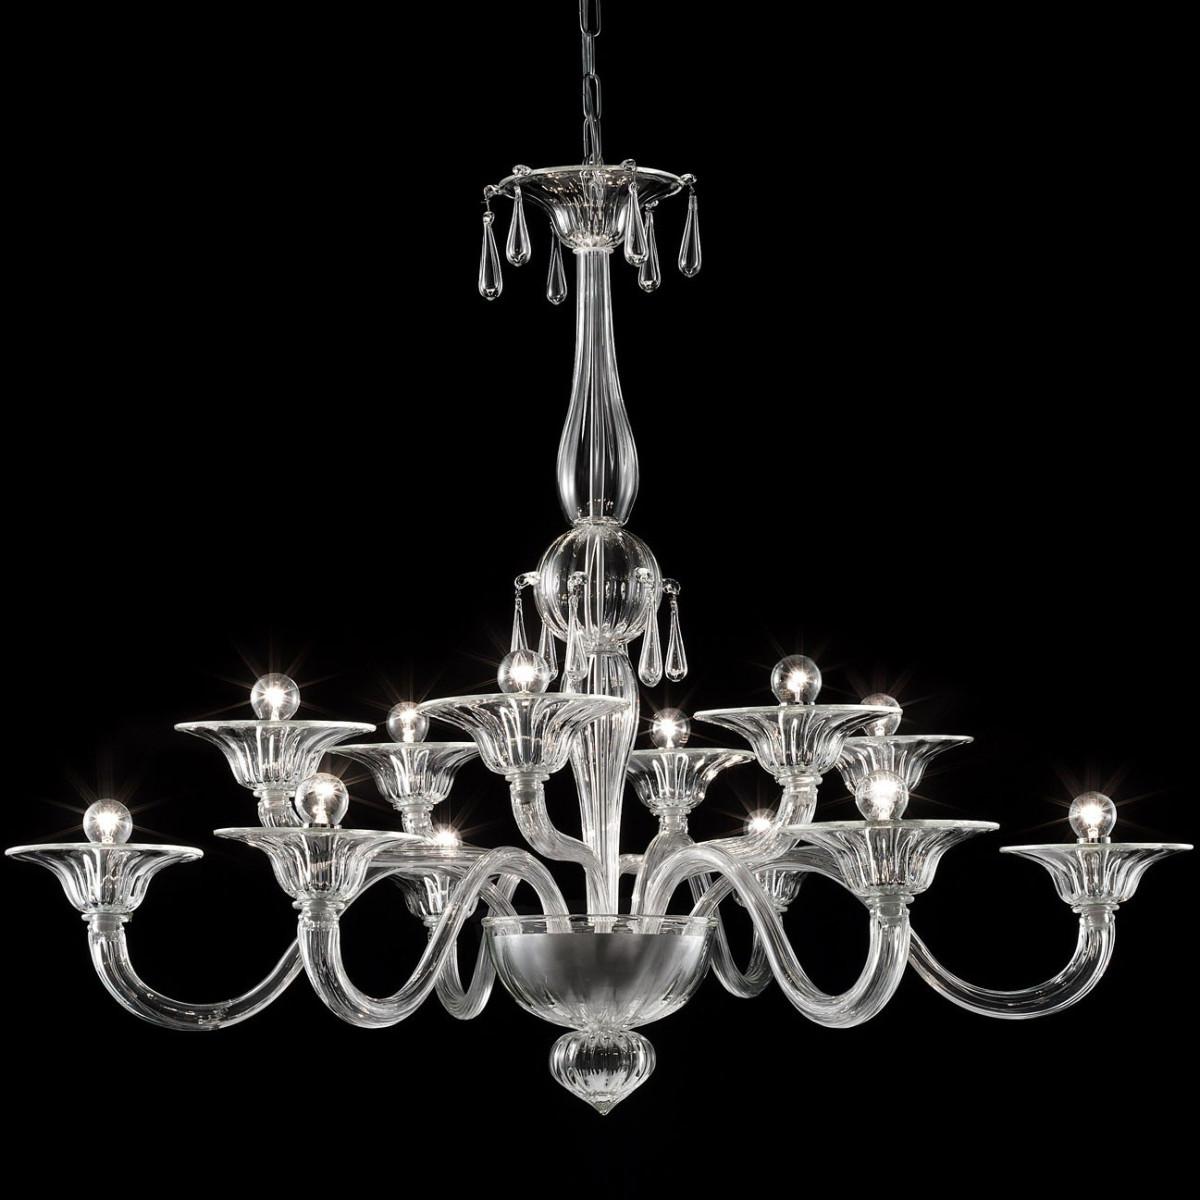 """Gioia"" lustre en verre de Murano - 12 lumieres, transparent"